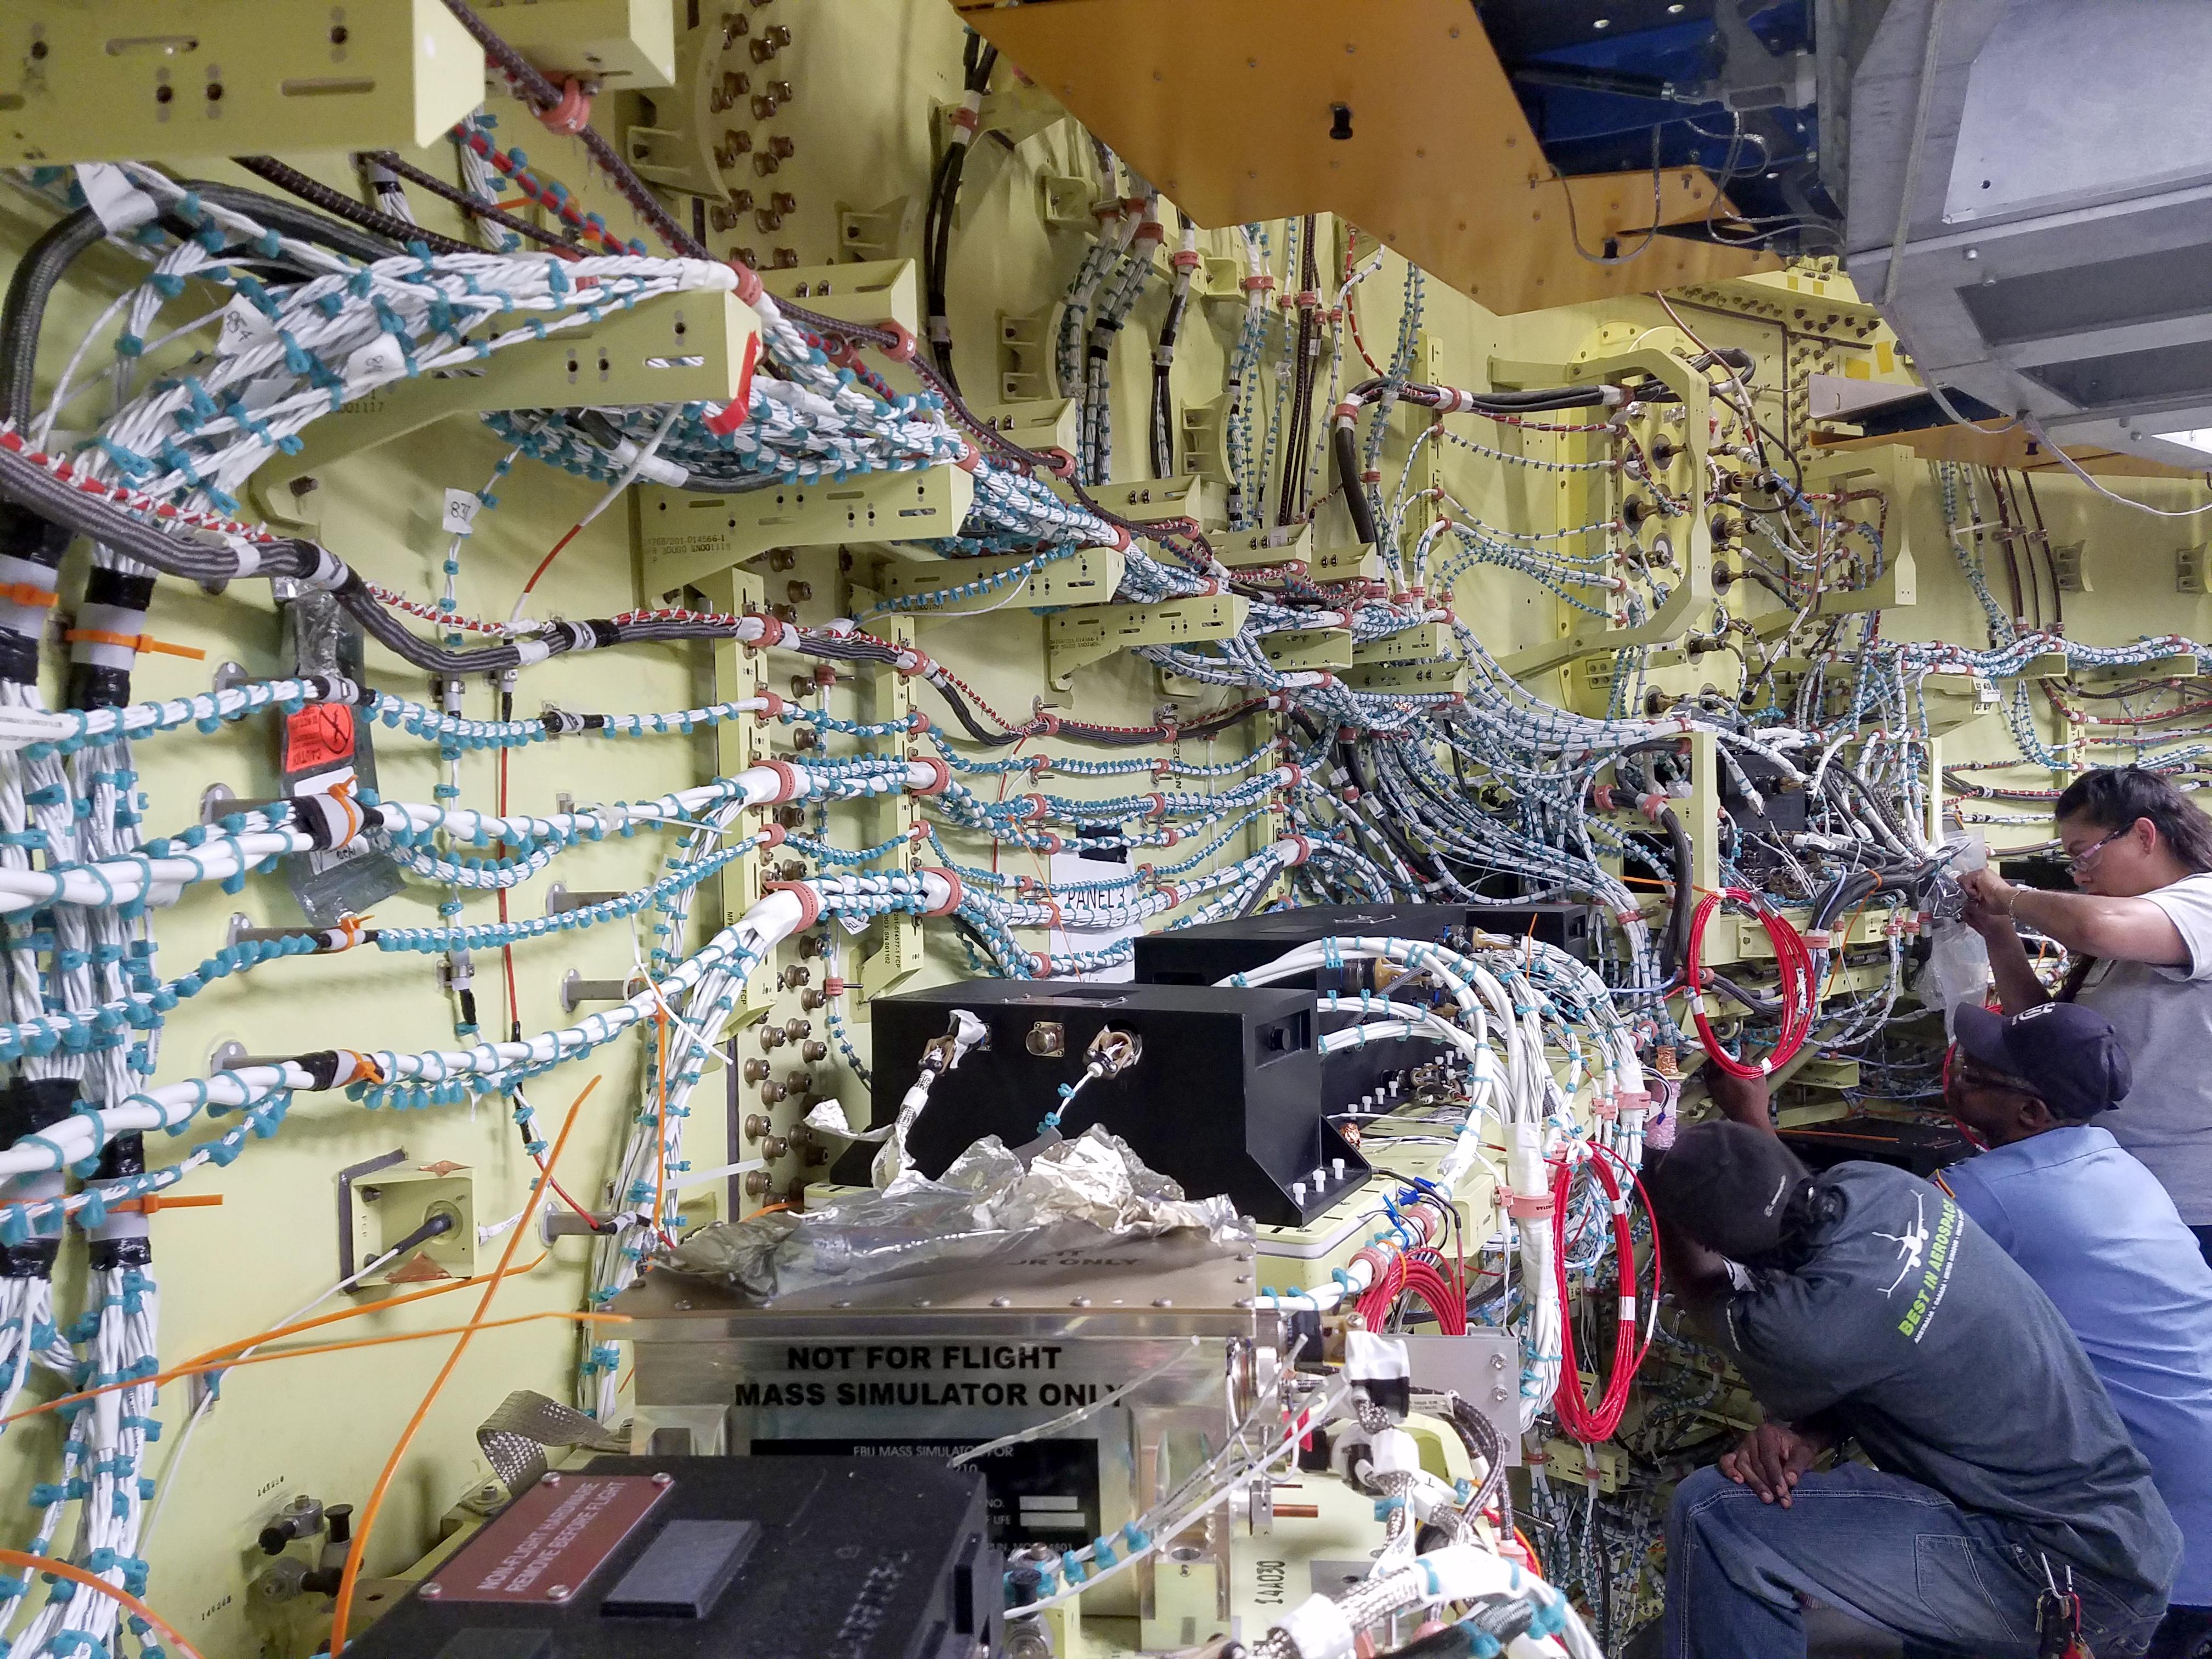 October 17 2018 Nasa Home Wiring Simulator Sls Avionics